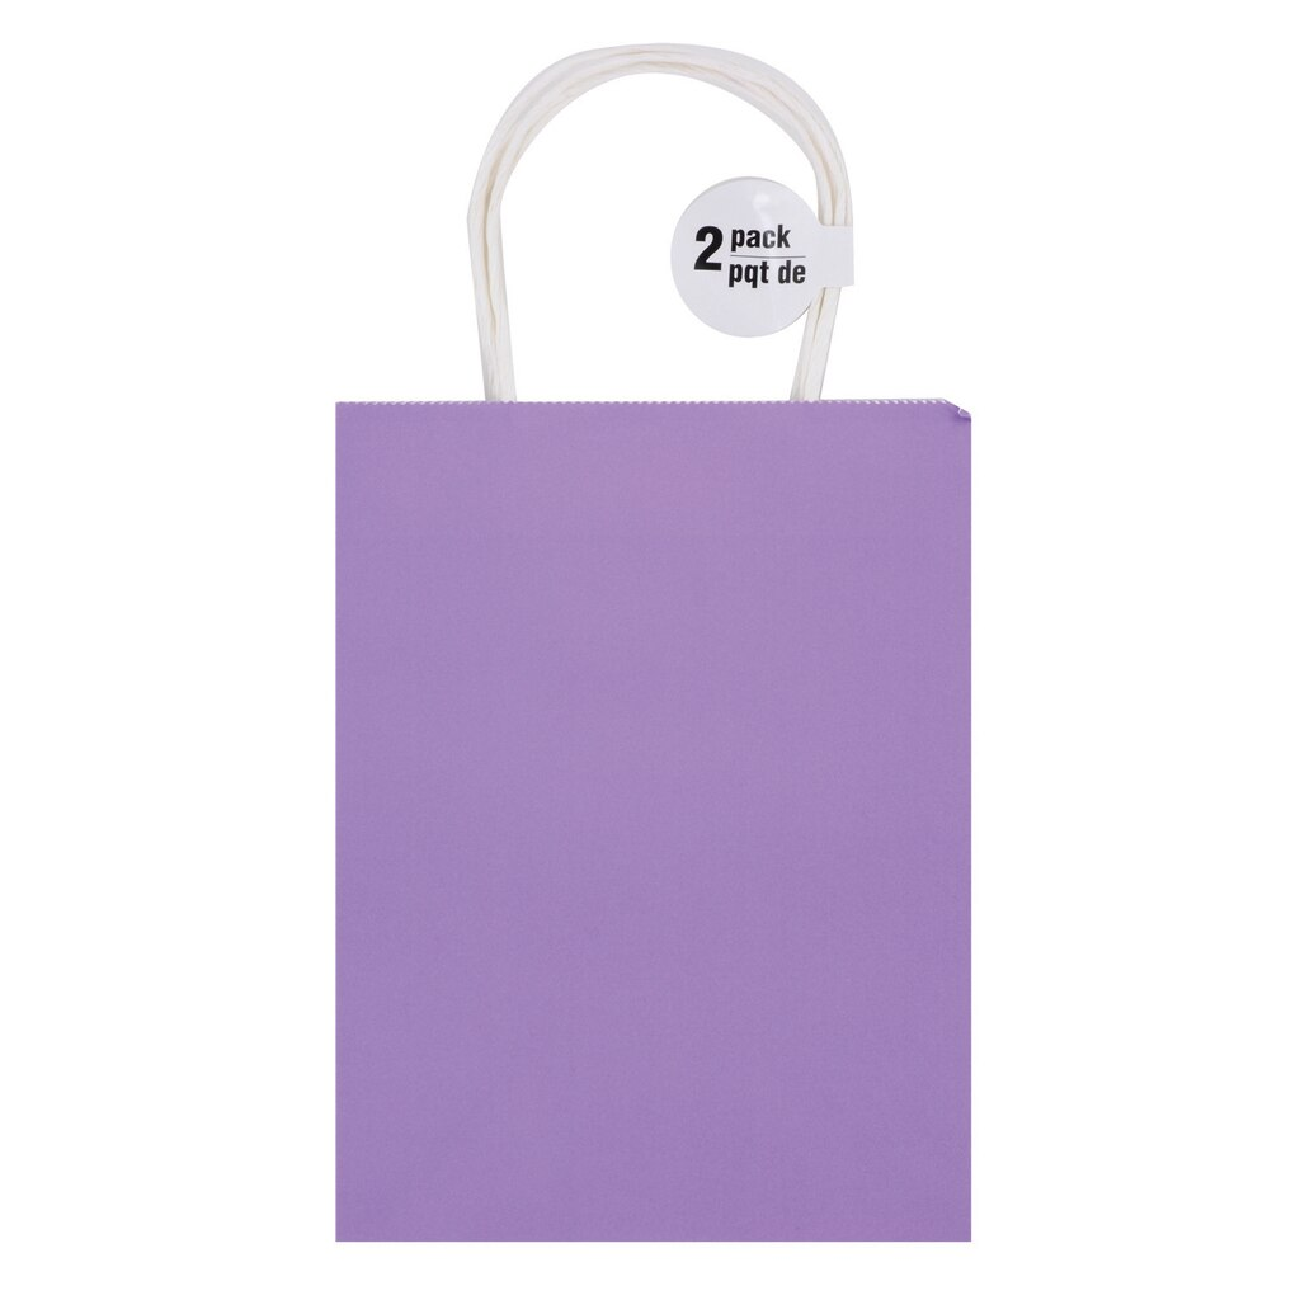 White Gift Bags Dollar Tree Inc